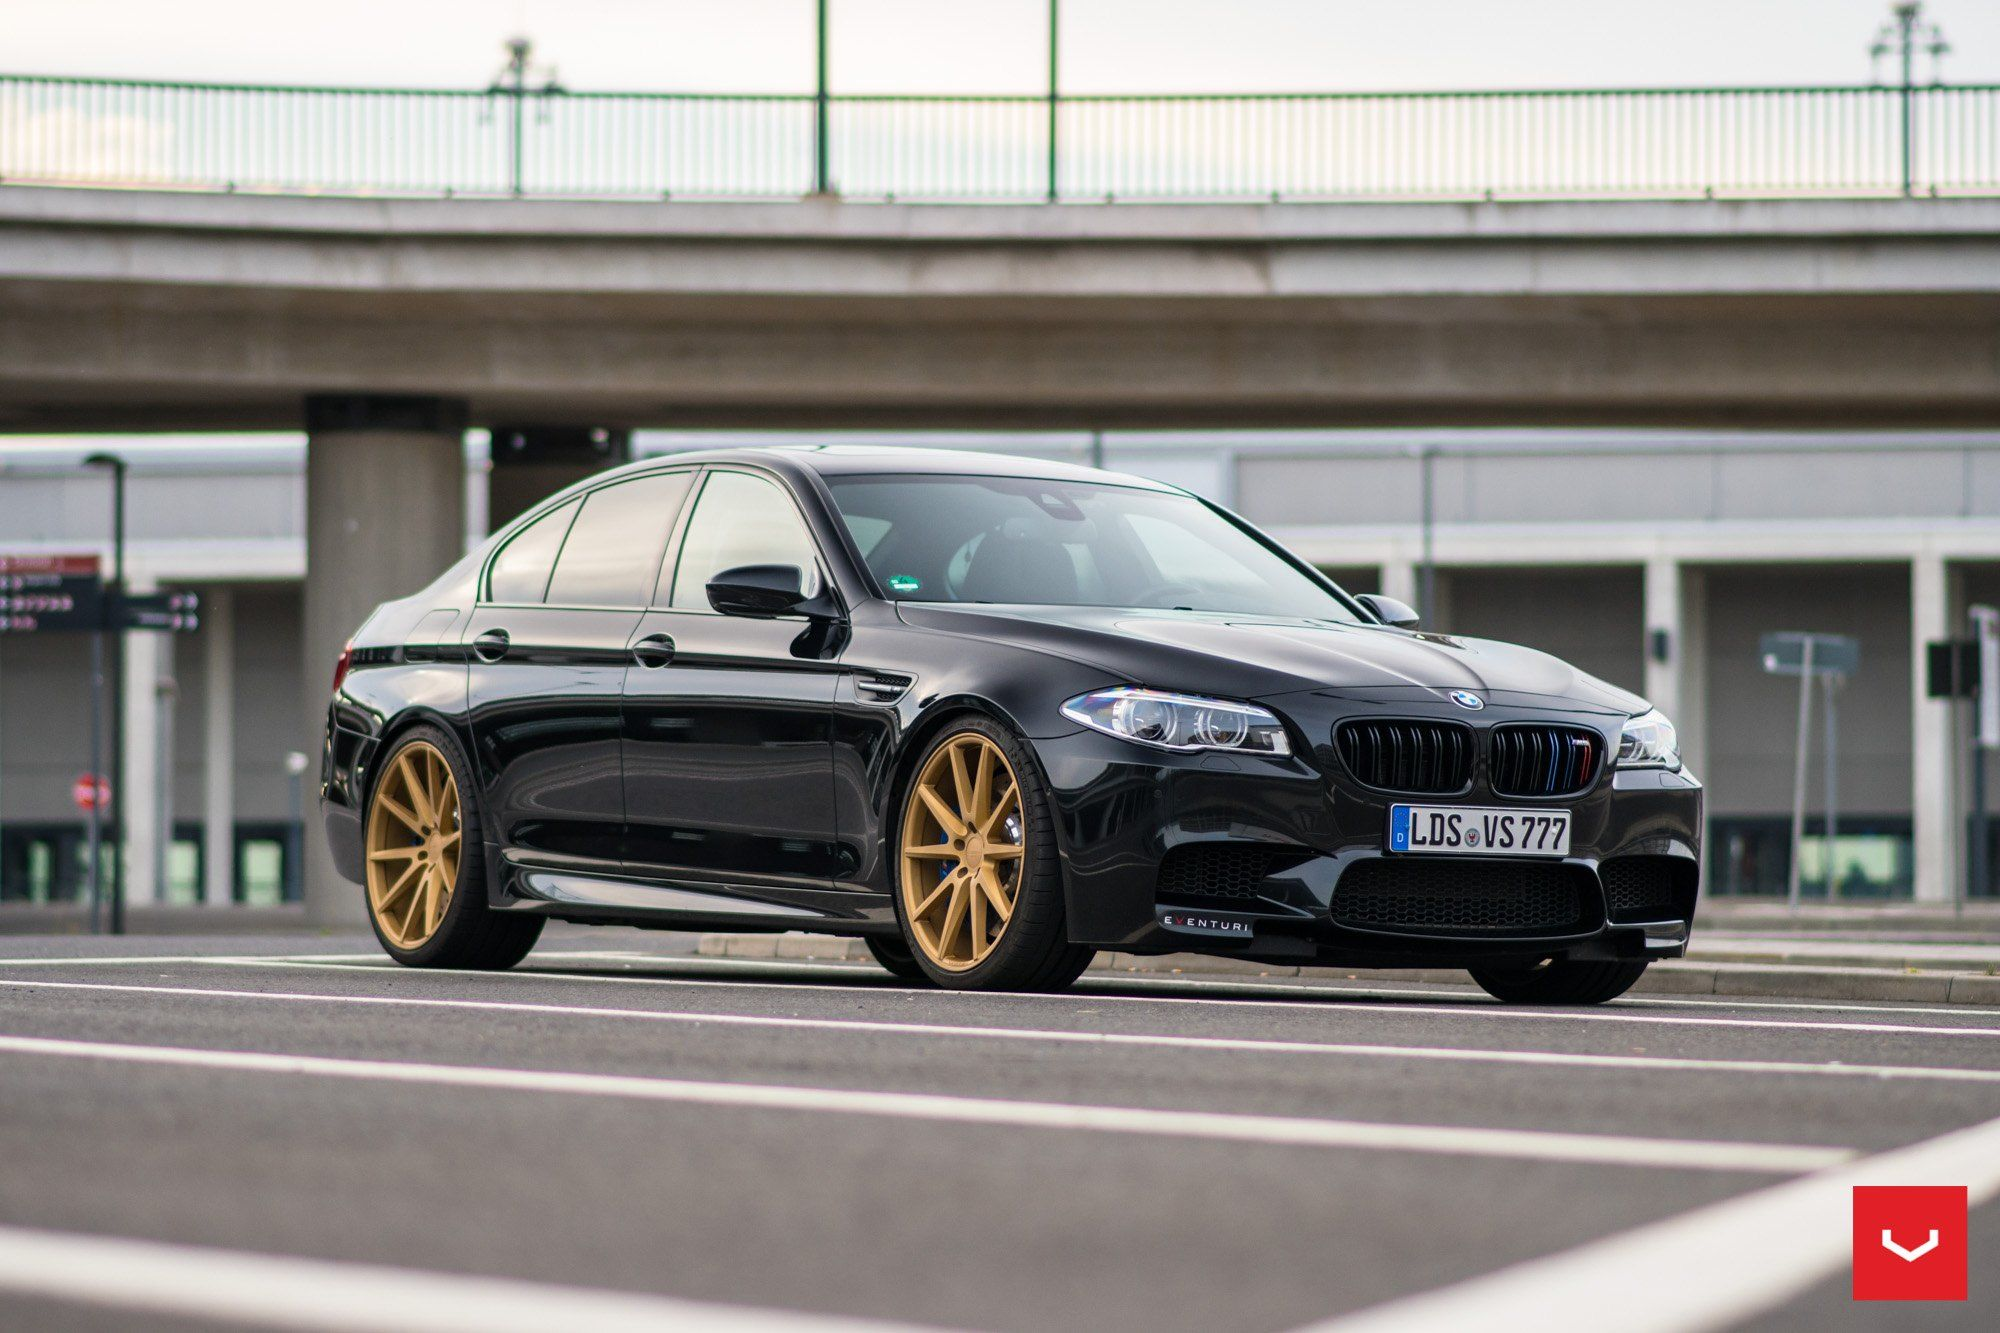 Bold Bmw 5 Series Sedan Rocking Gold Vossen Rims With Images